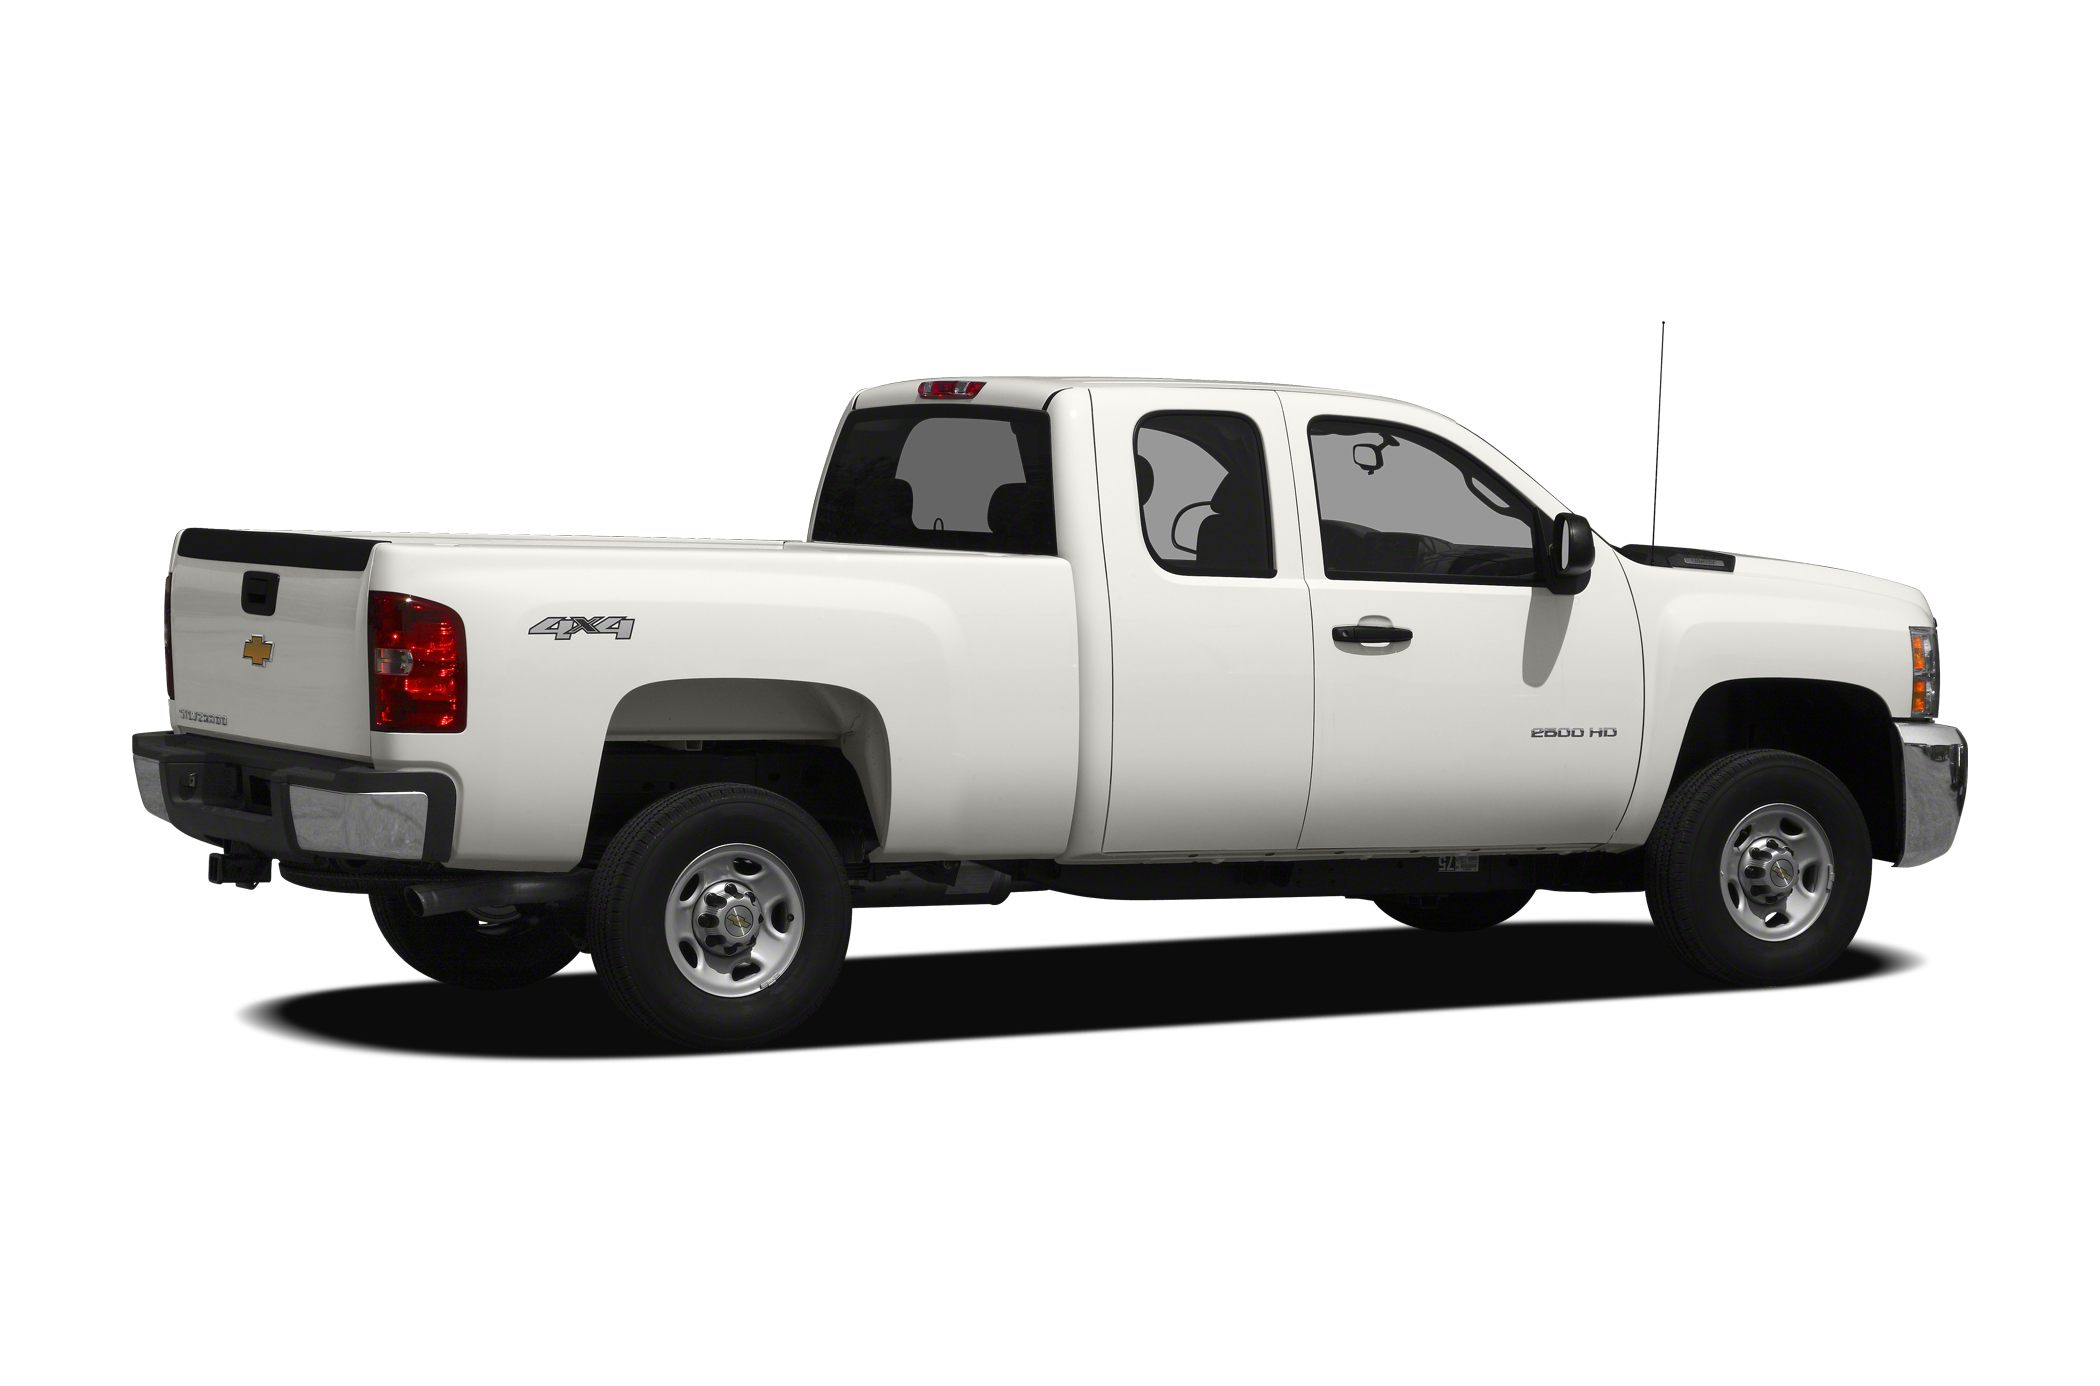 2009 Chevrolet Silverado 2500HD LTZ Vehicle Options 4WDAWD Front Air Dam Rear Window Defogger ABS